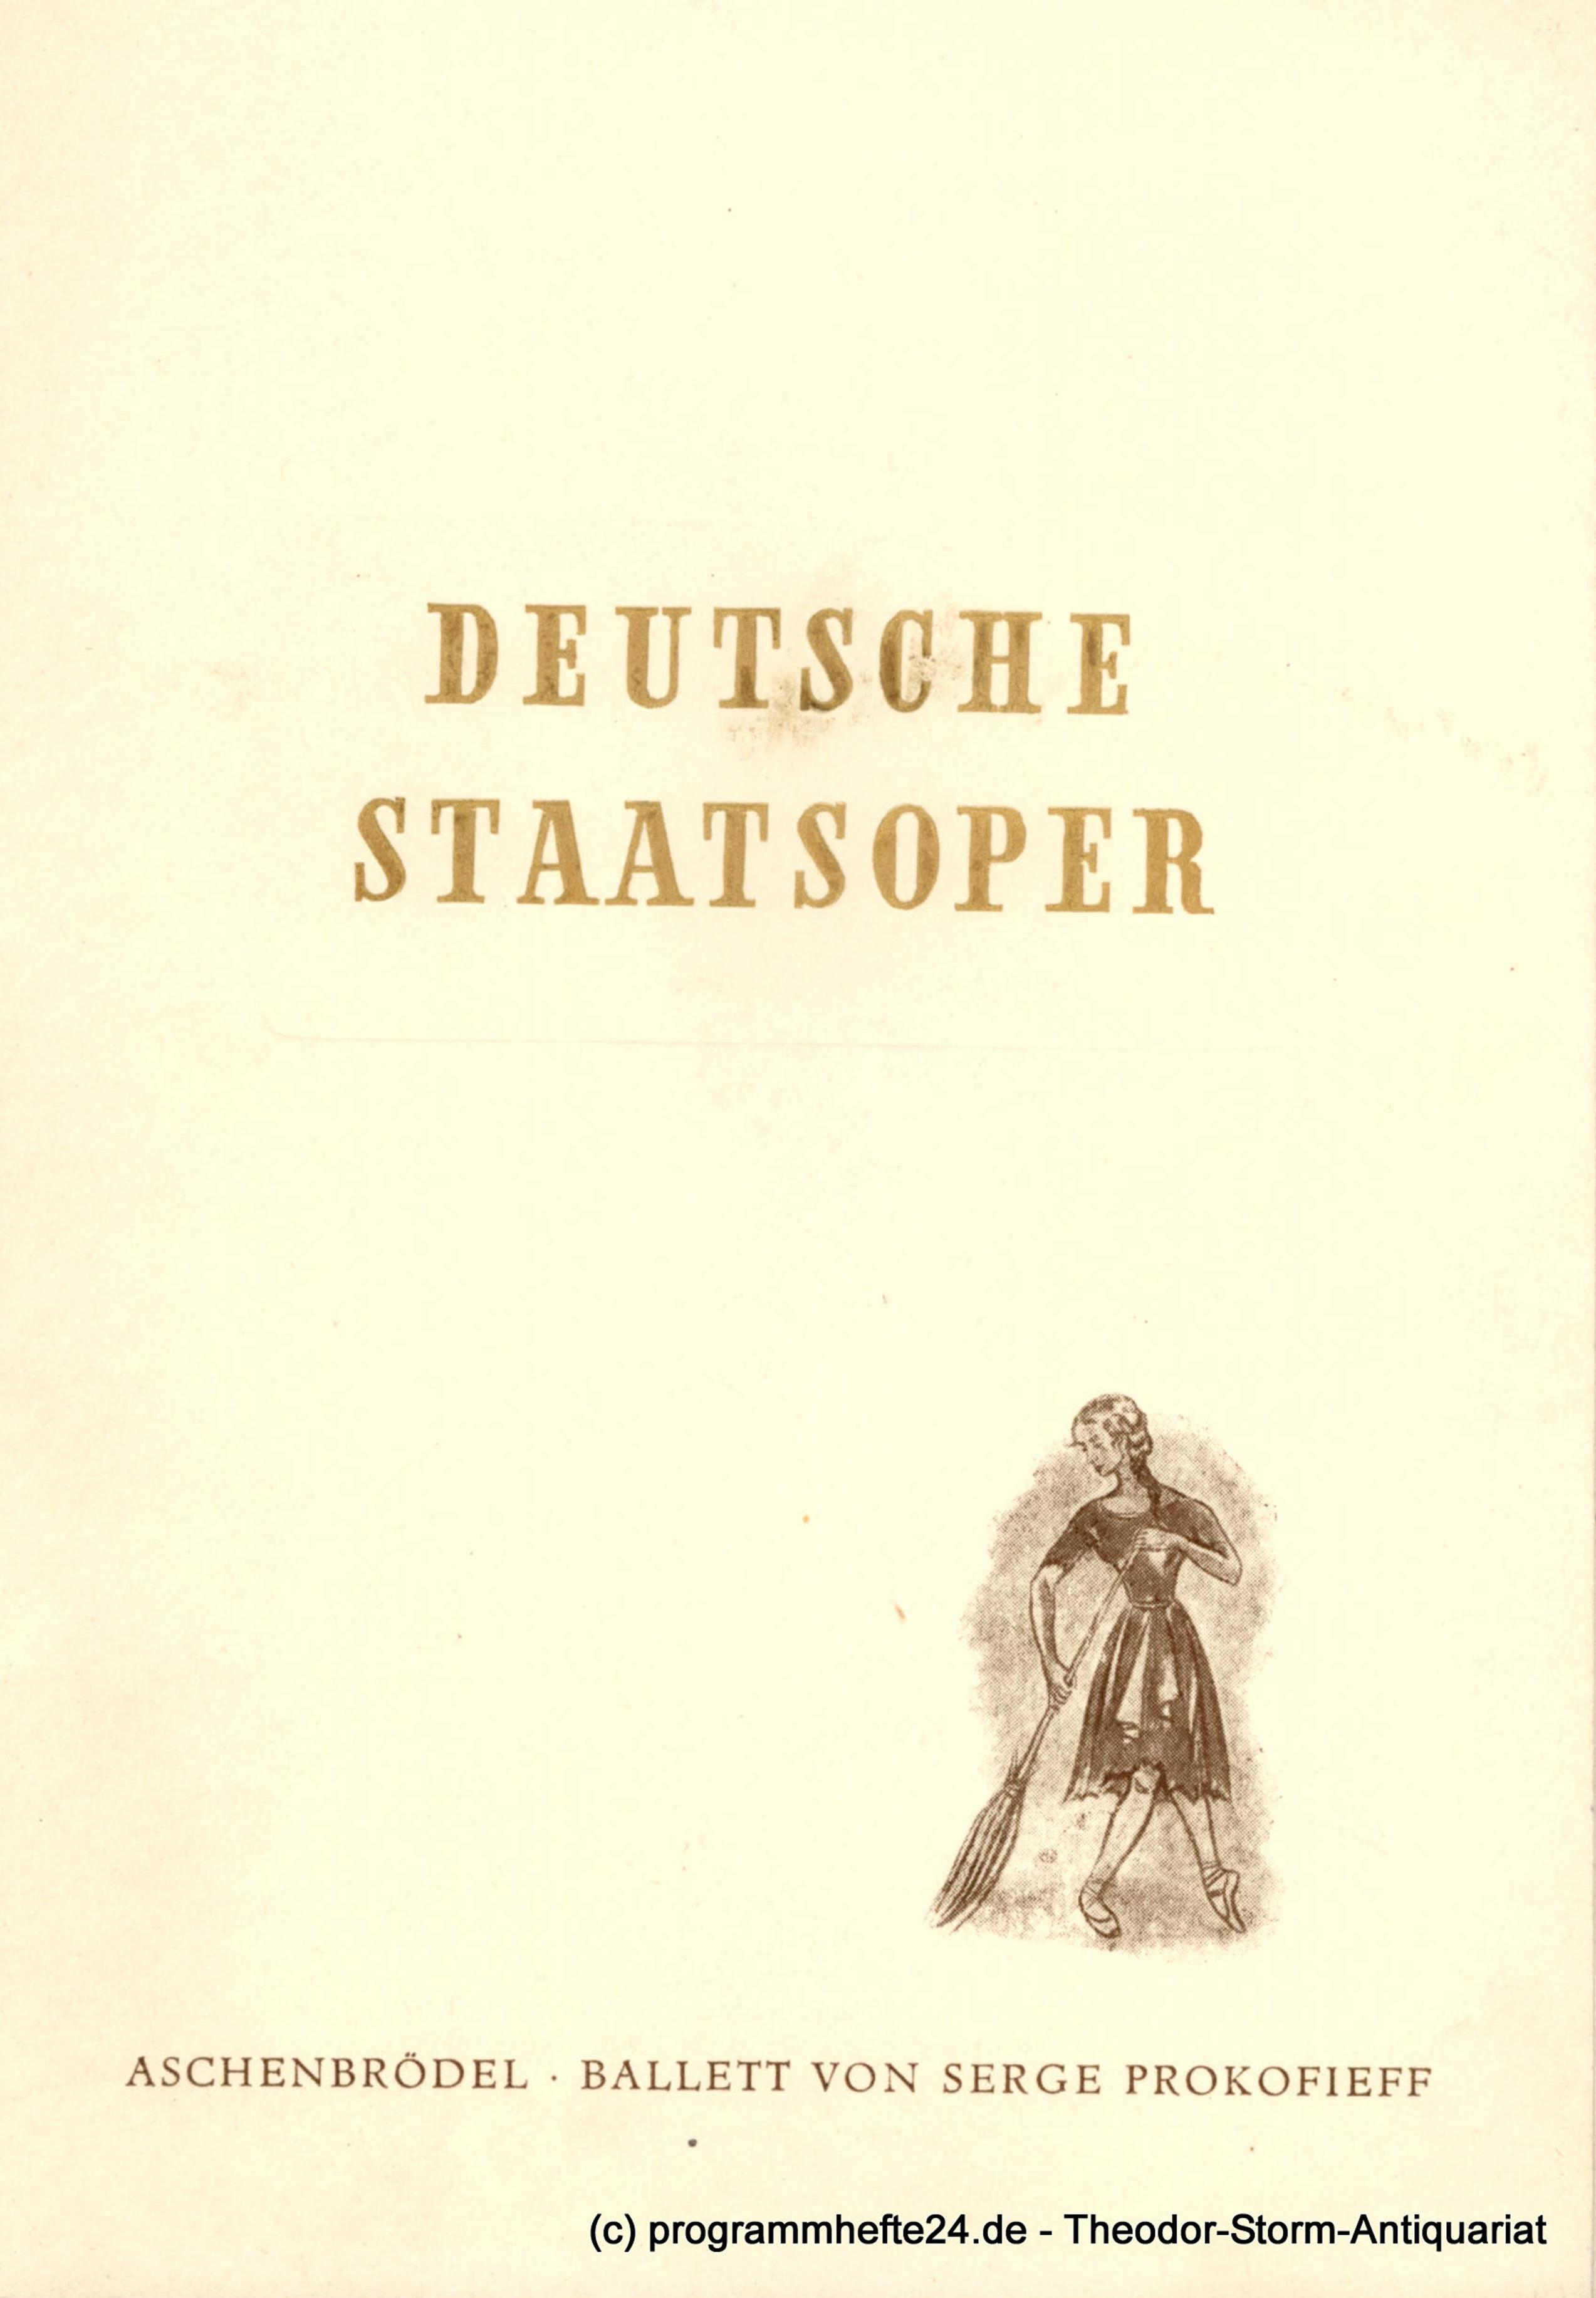 Programmheft Deutsches Staatsoper Berlin Aschenbrödel 1952